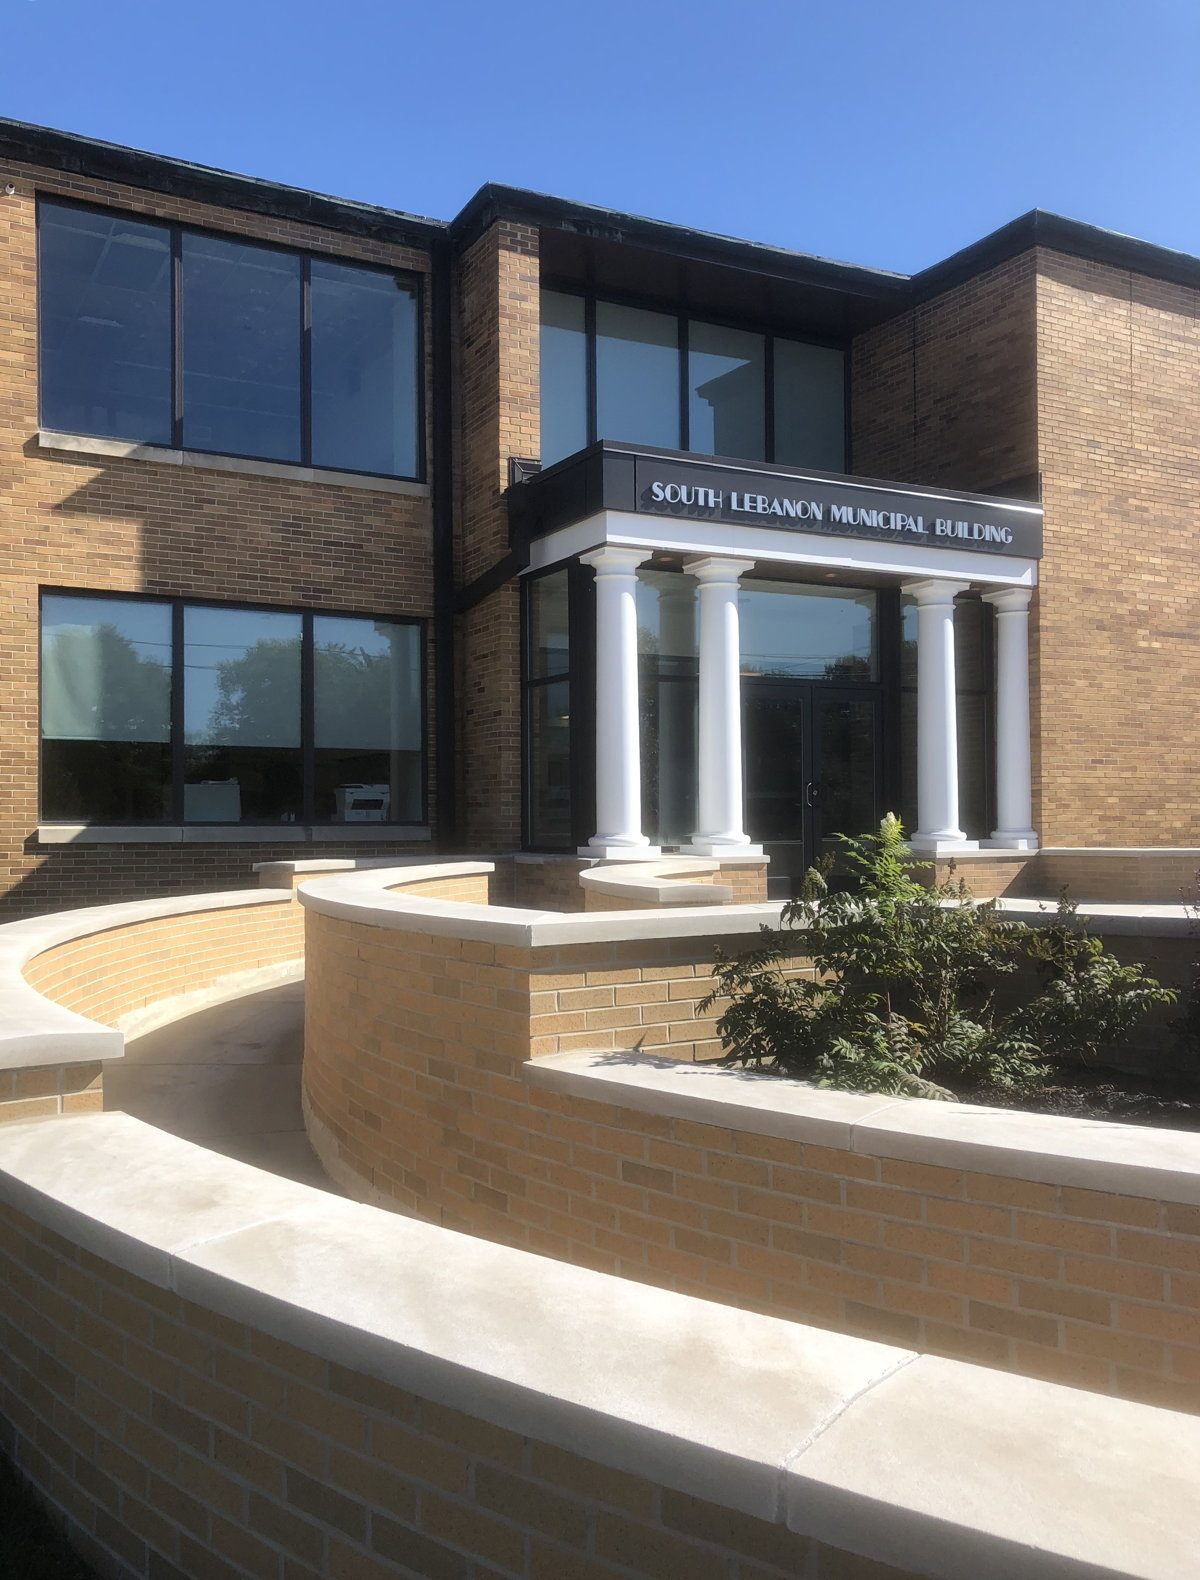 Dedication of a New Municipal Building